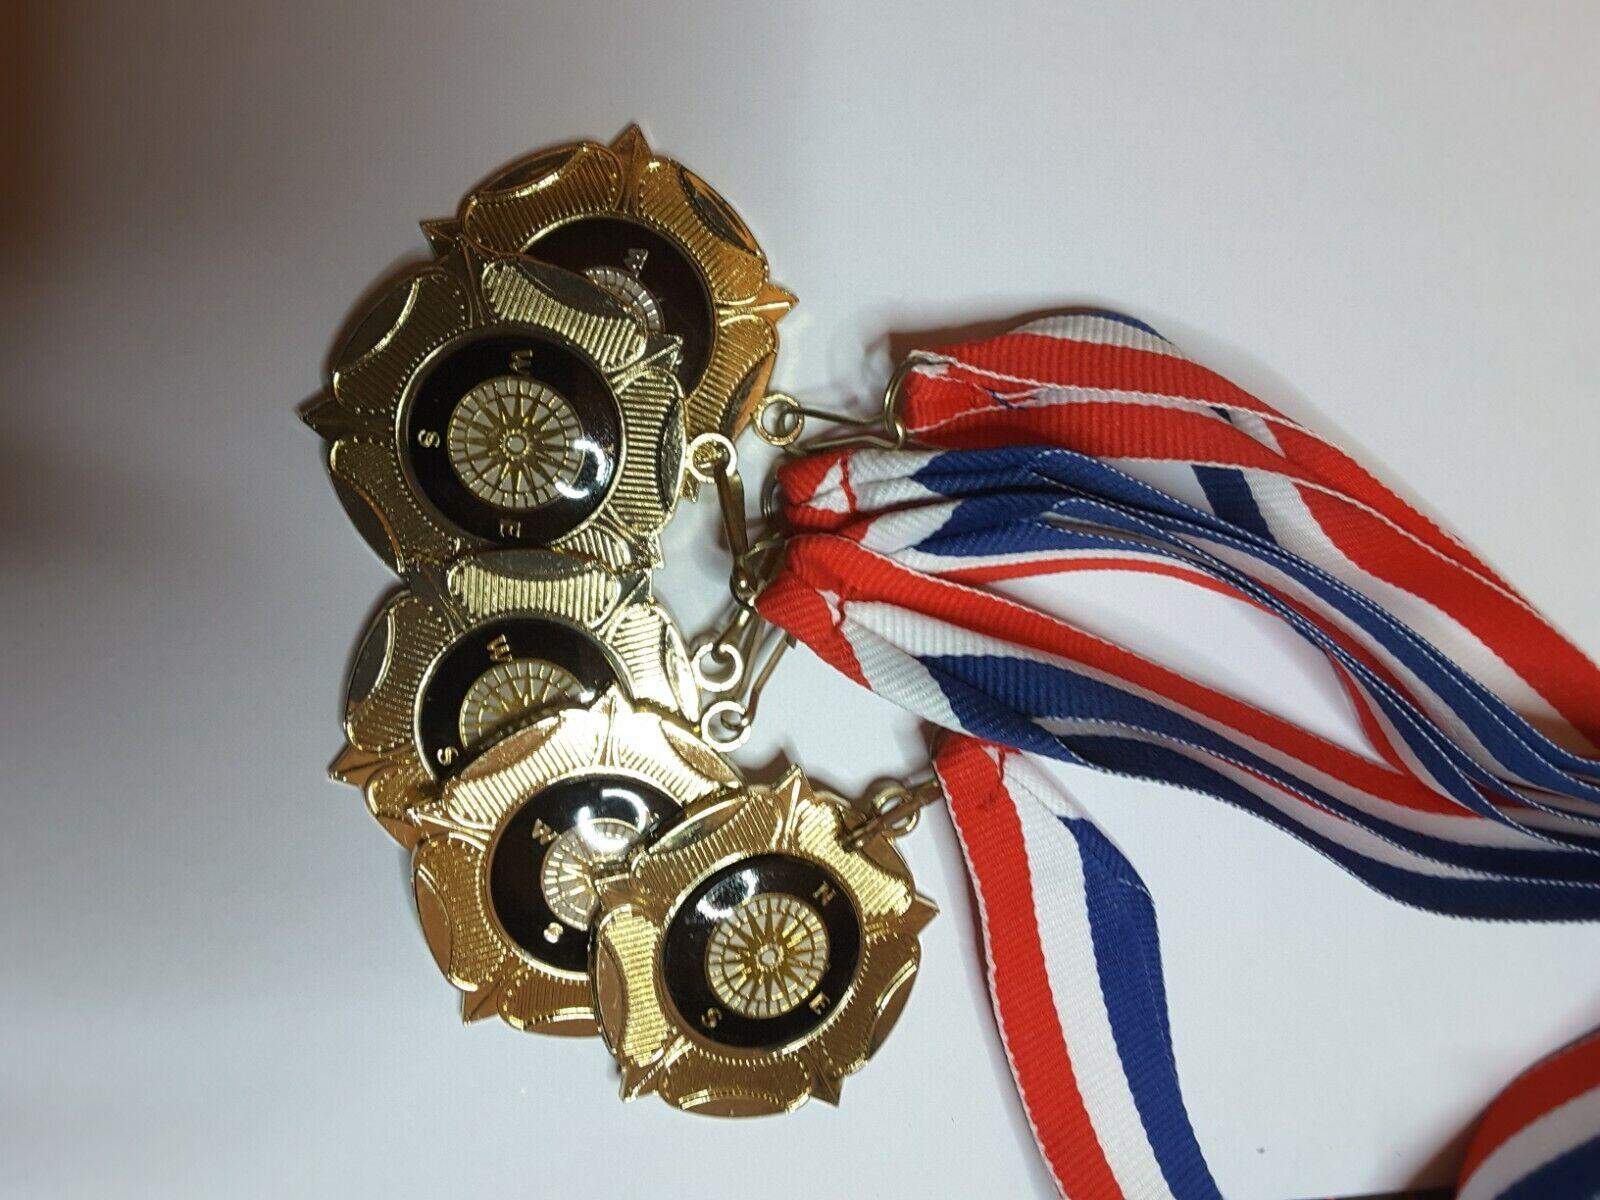 New Award medals inc ribbons x12